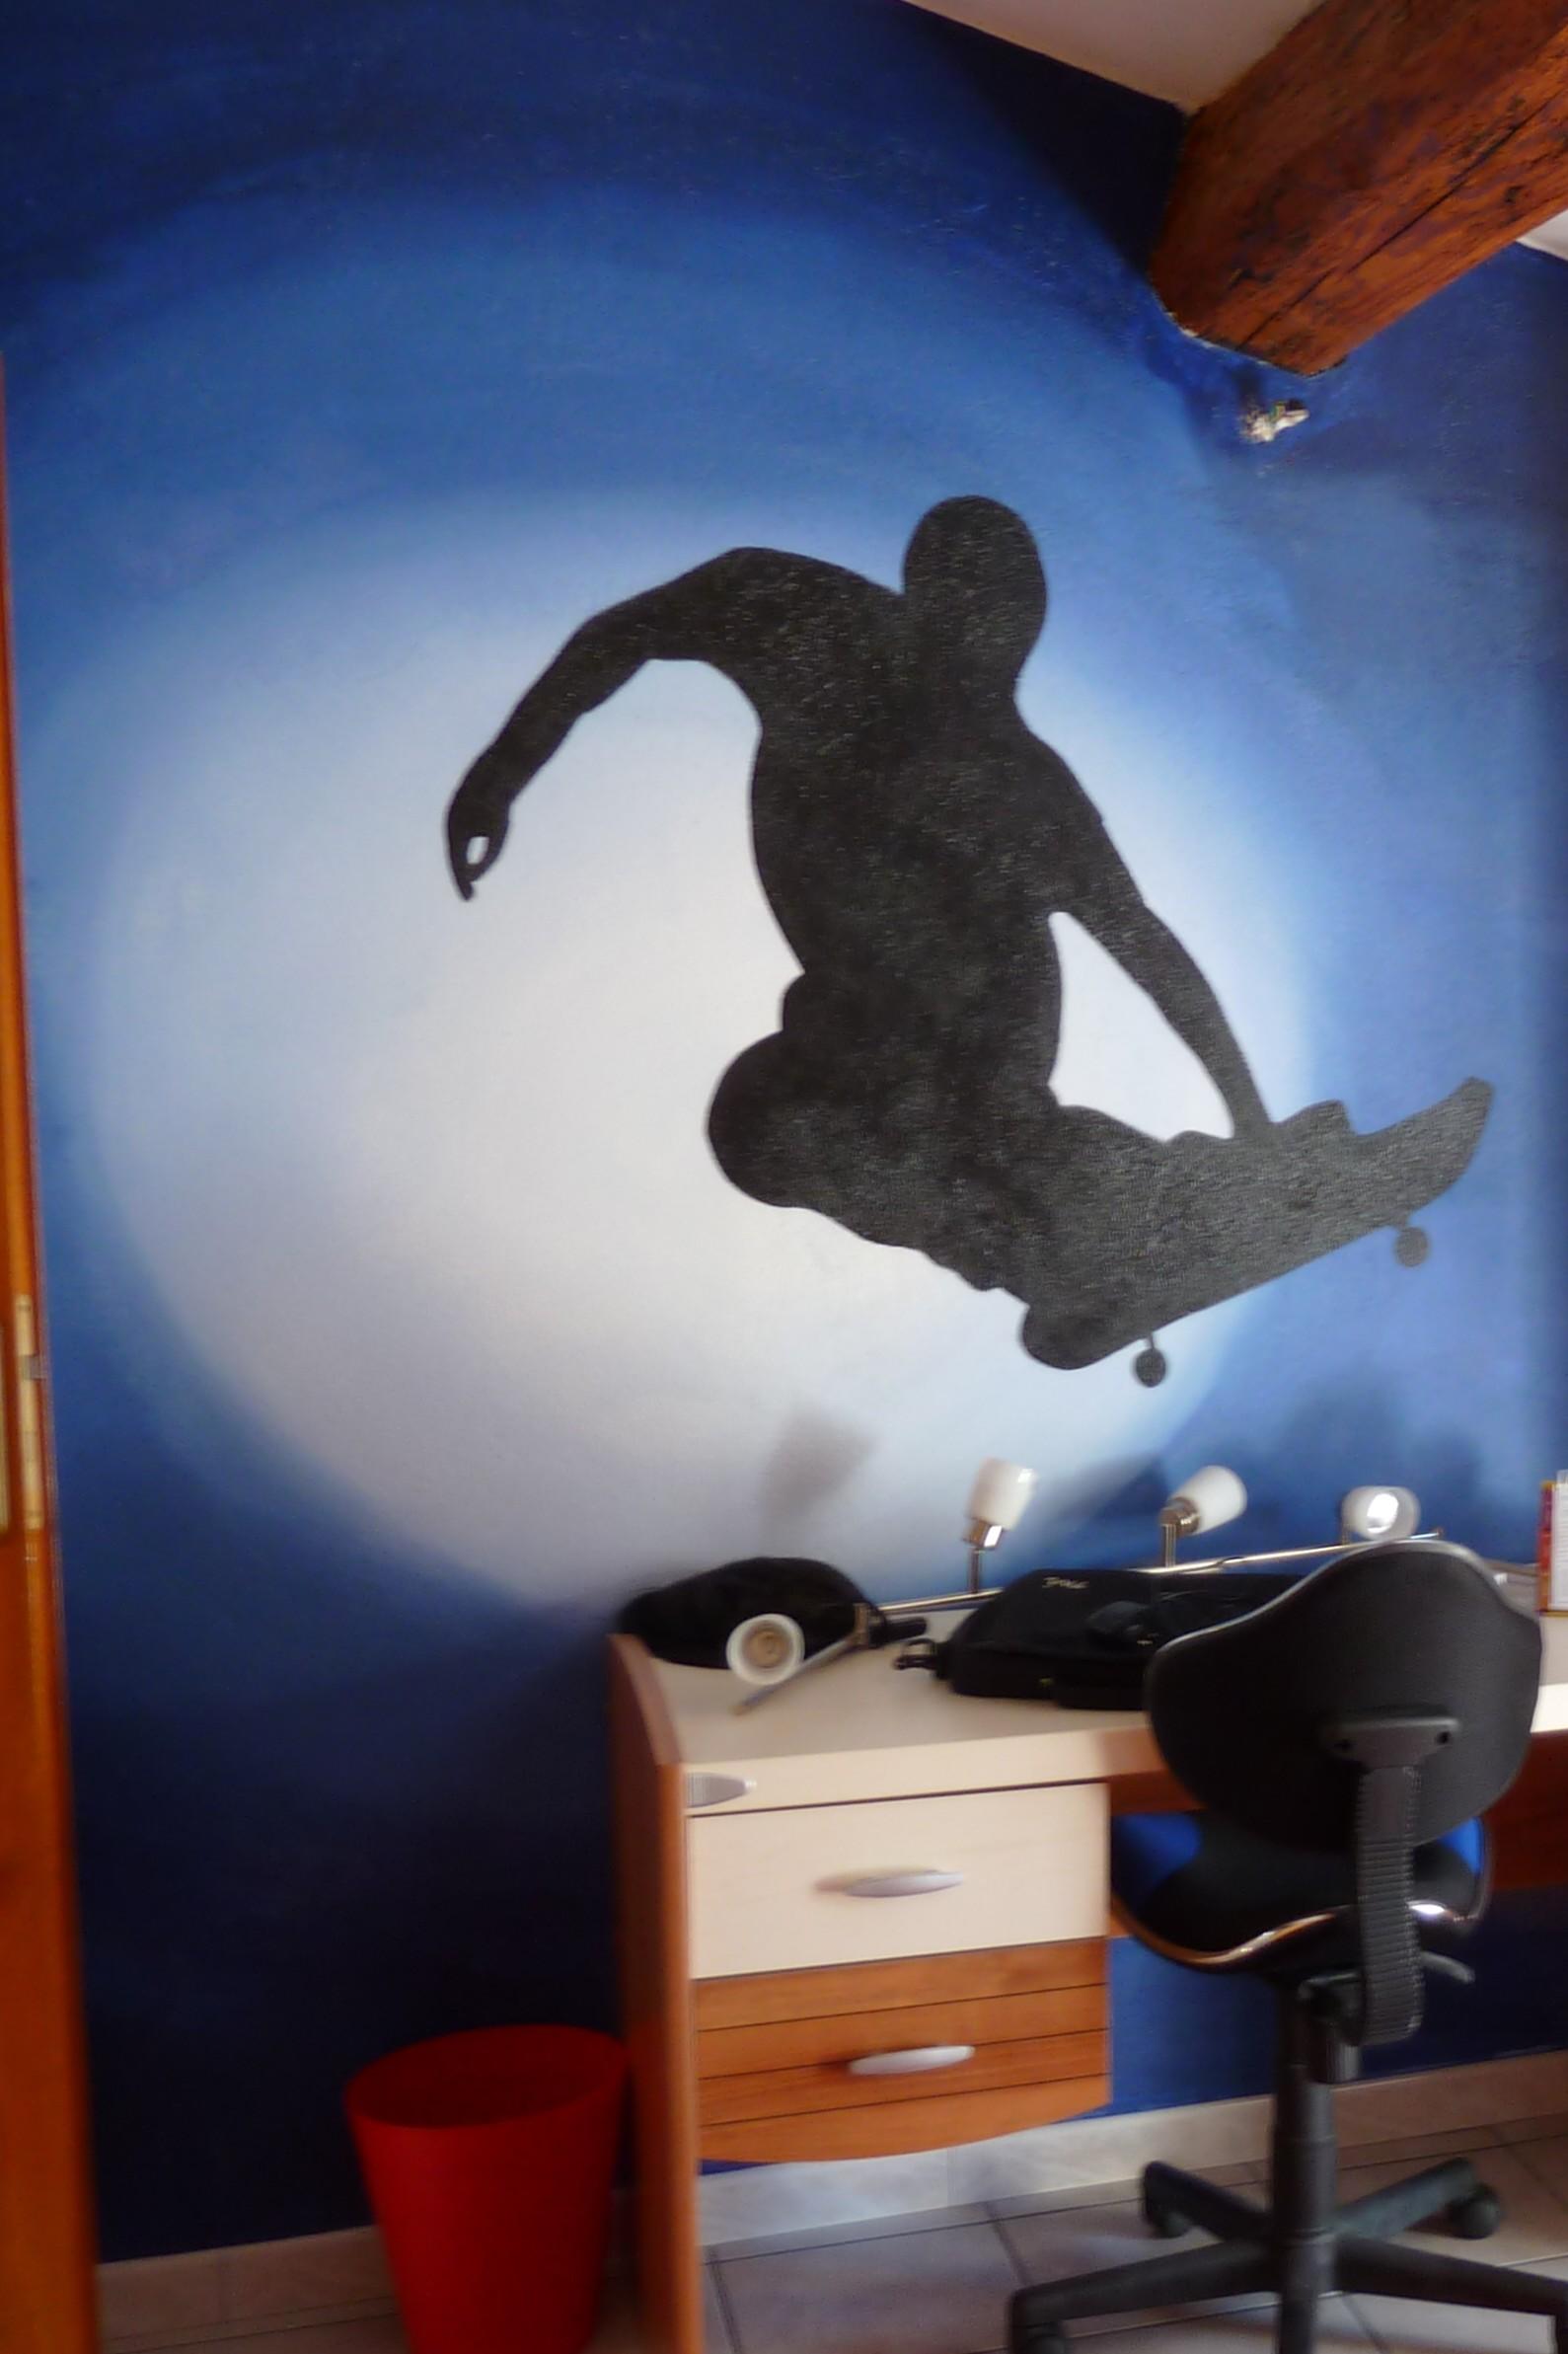 chambre garçon, thème sport skate board.